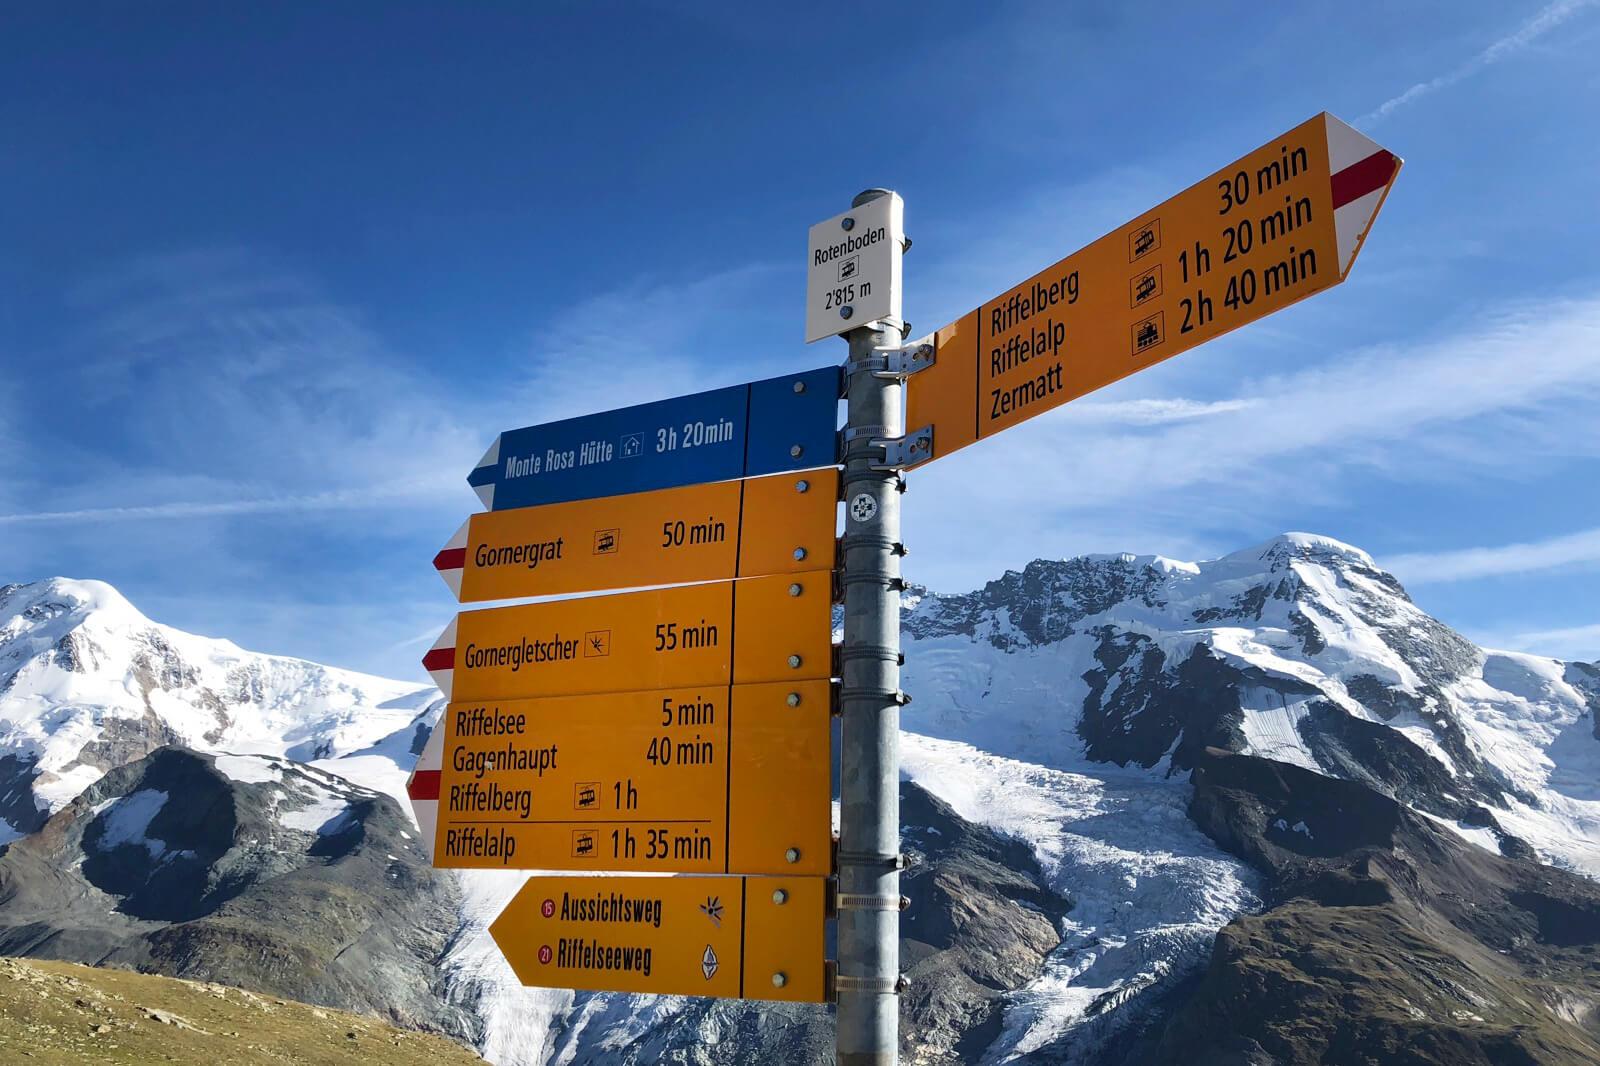 Hike in Zermatt, Switzerland